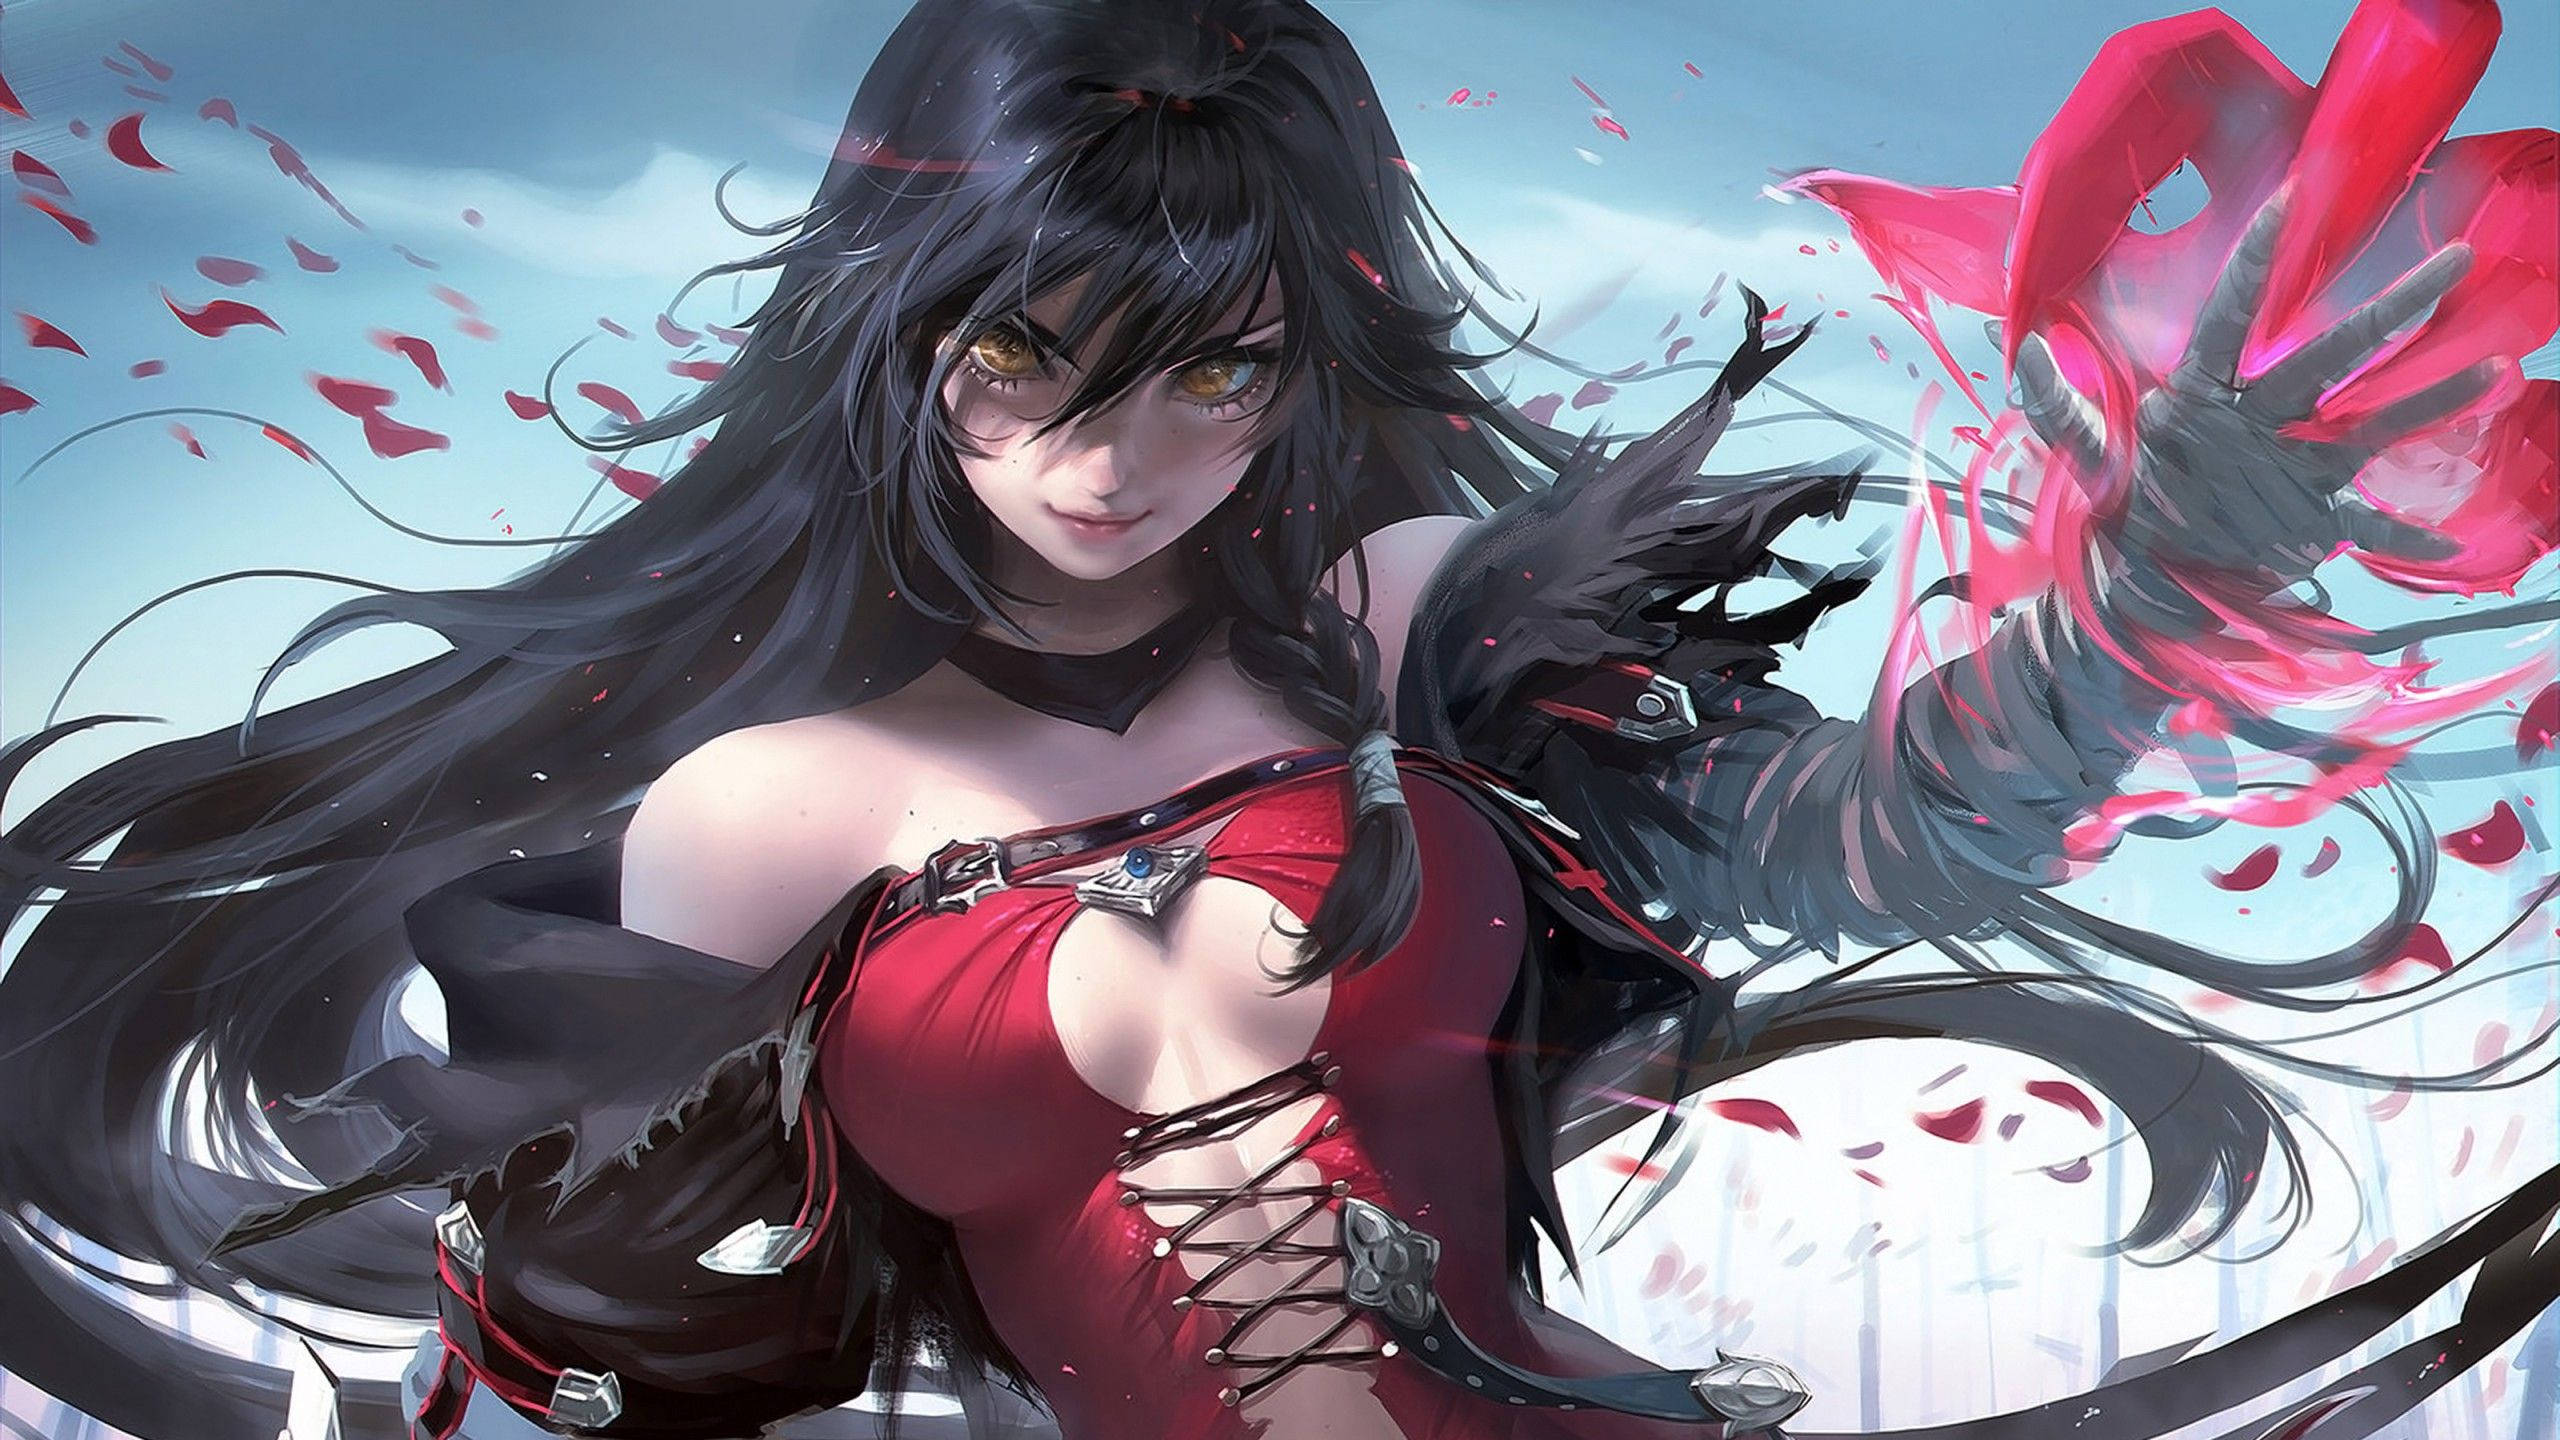 Anime Anime Girls Black Hair Long Hair Bangs Braided Hair Red Dress Armor Gloves Choker Magic Red Pe 2560x1440